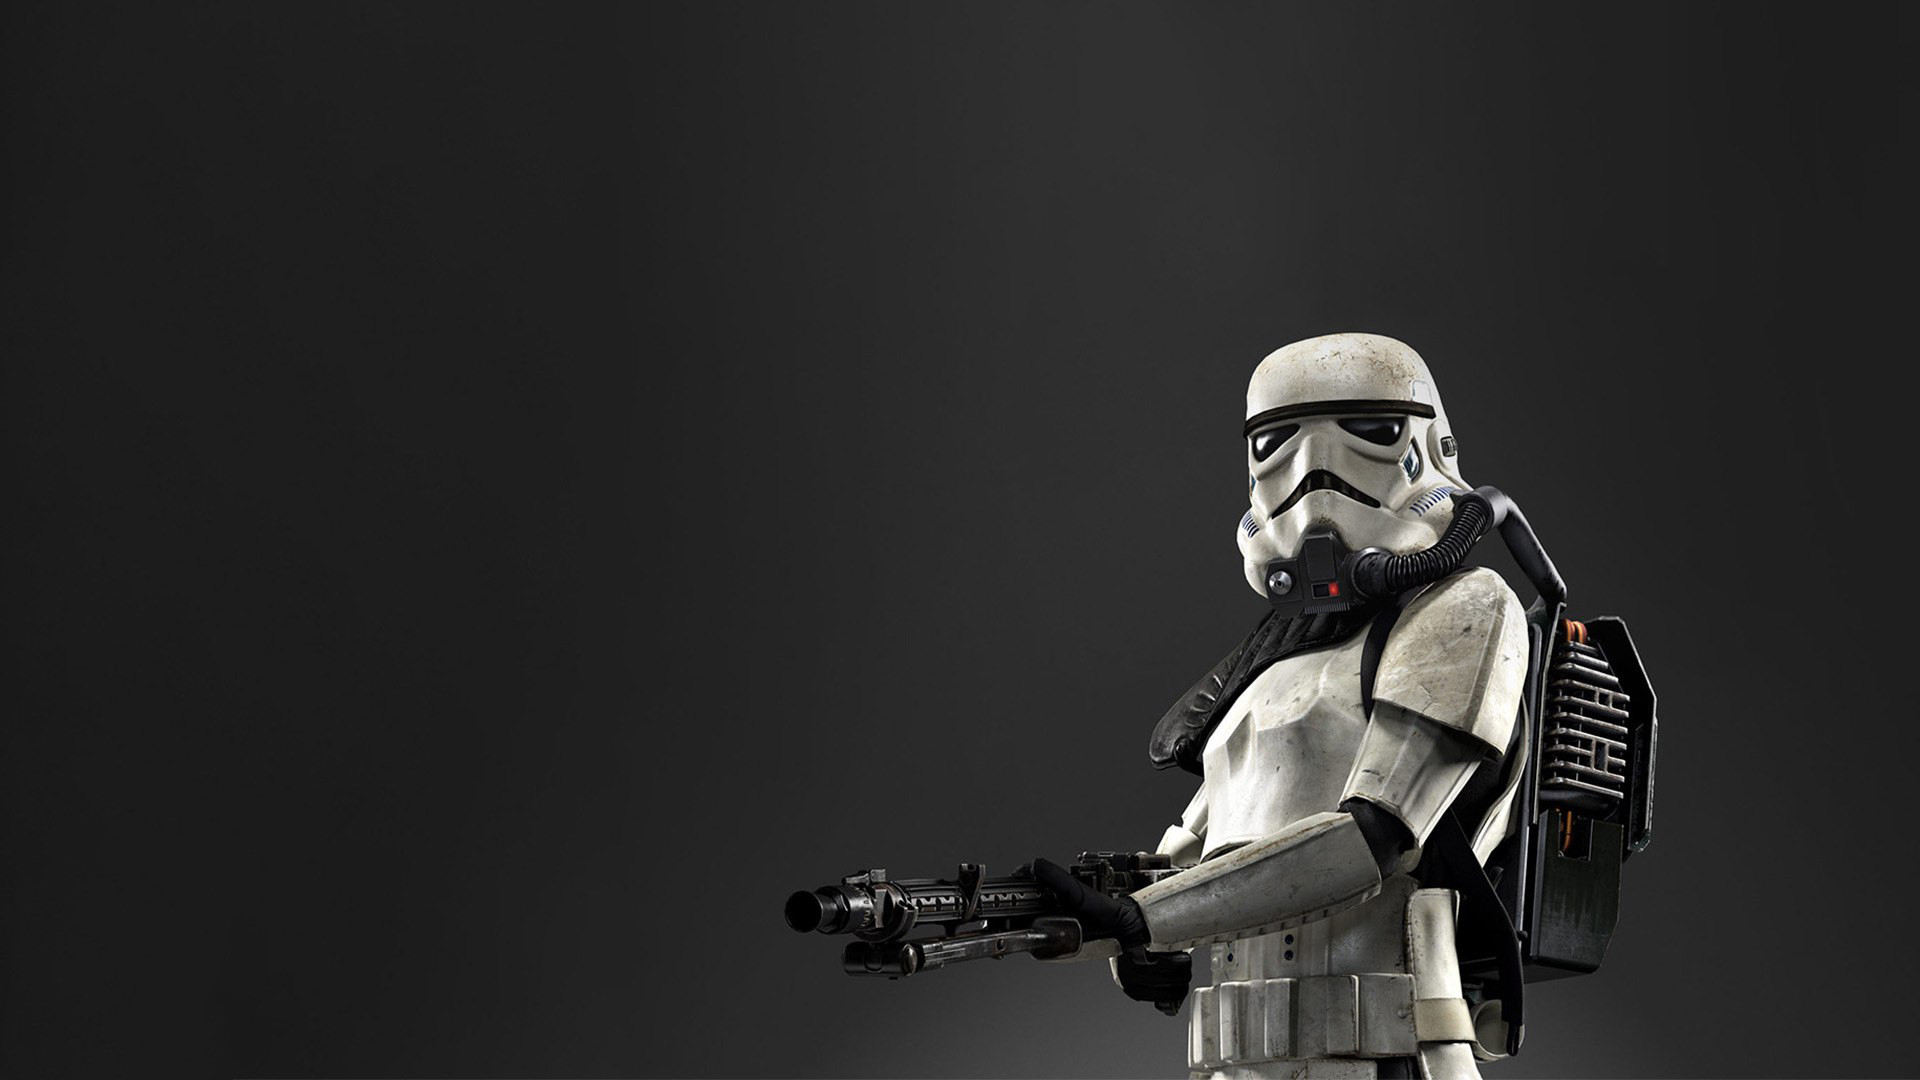 Star Wars Stormtrooper Desktop Wallpaper (70+ images)